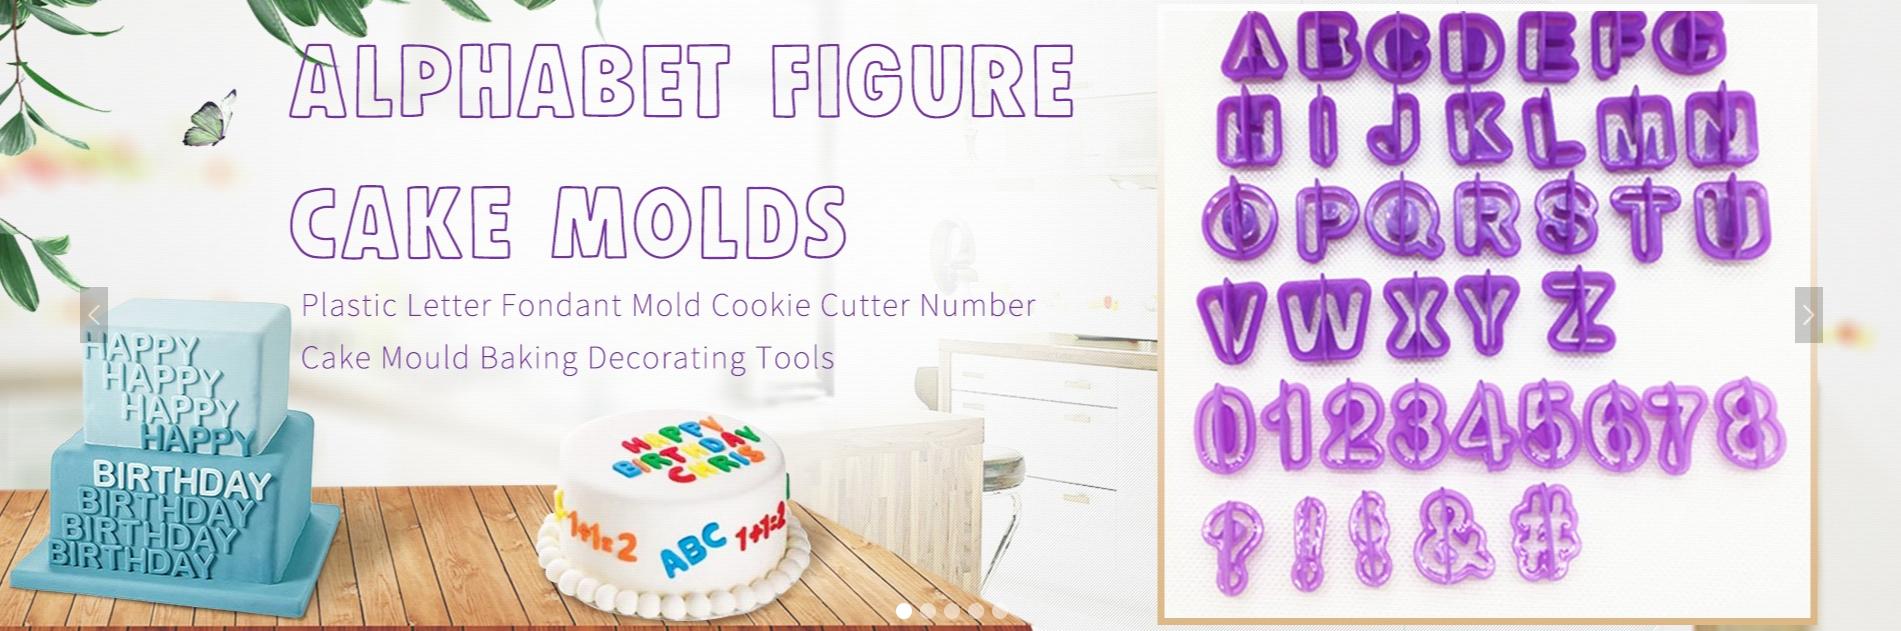 Cake Molds